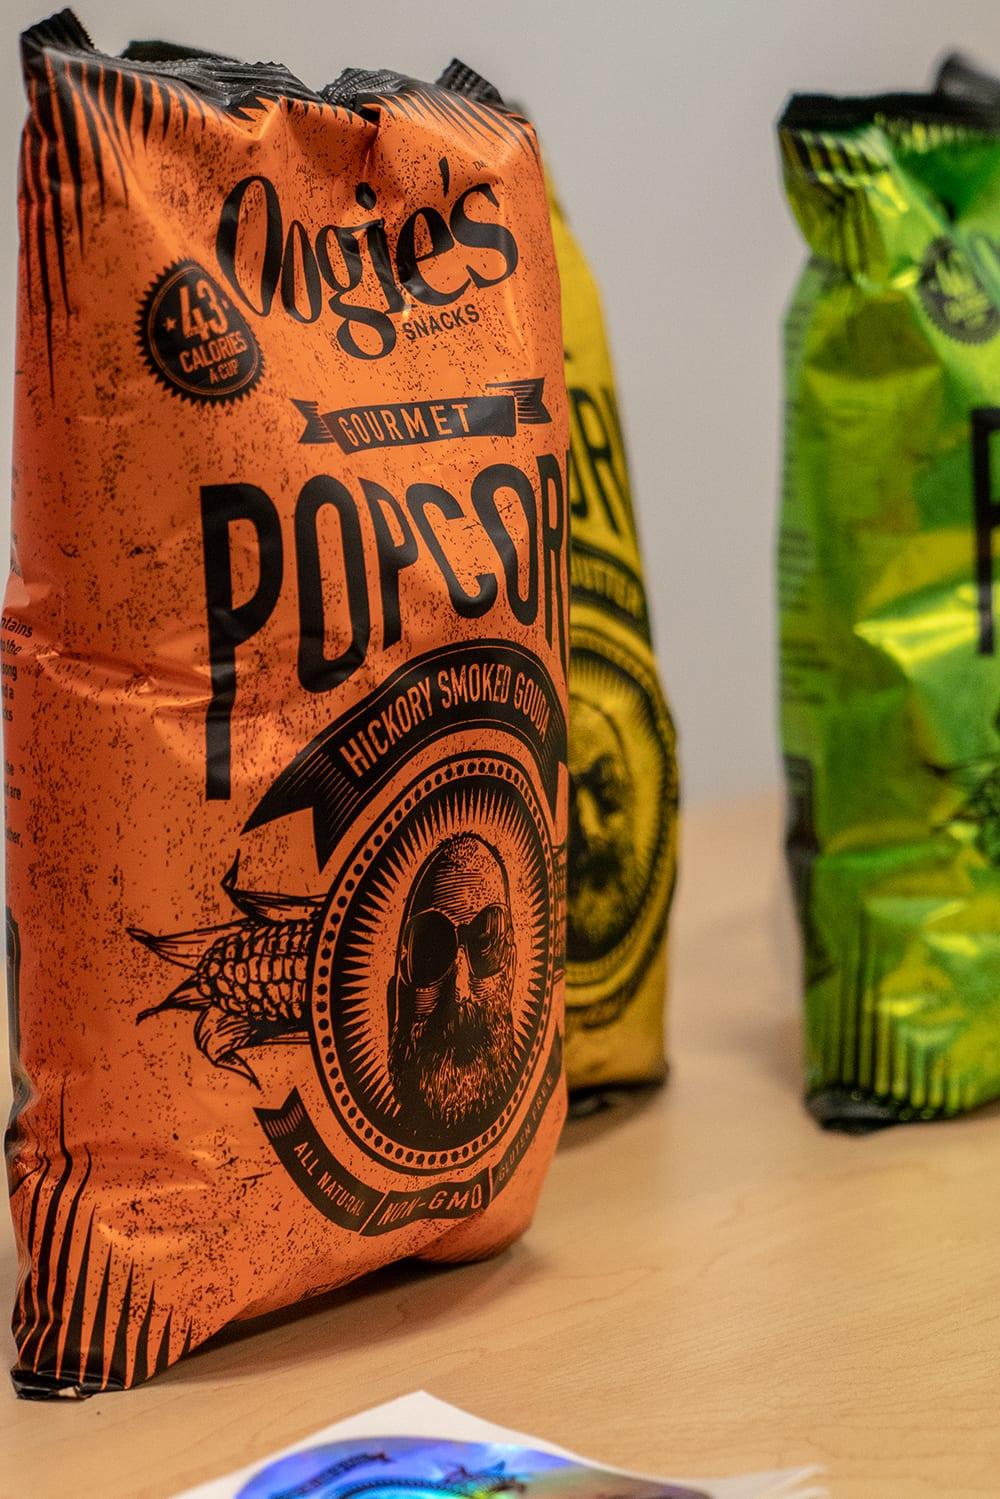 Oogie's Gourmet Popcorn Hickory Smoked Gouda